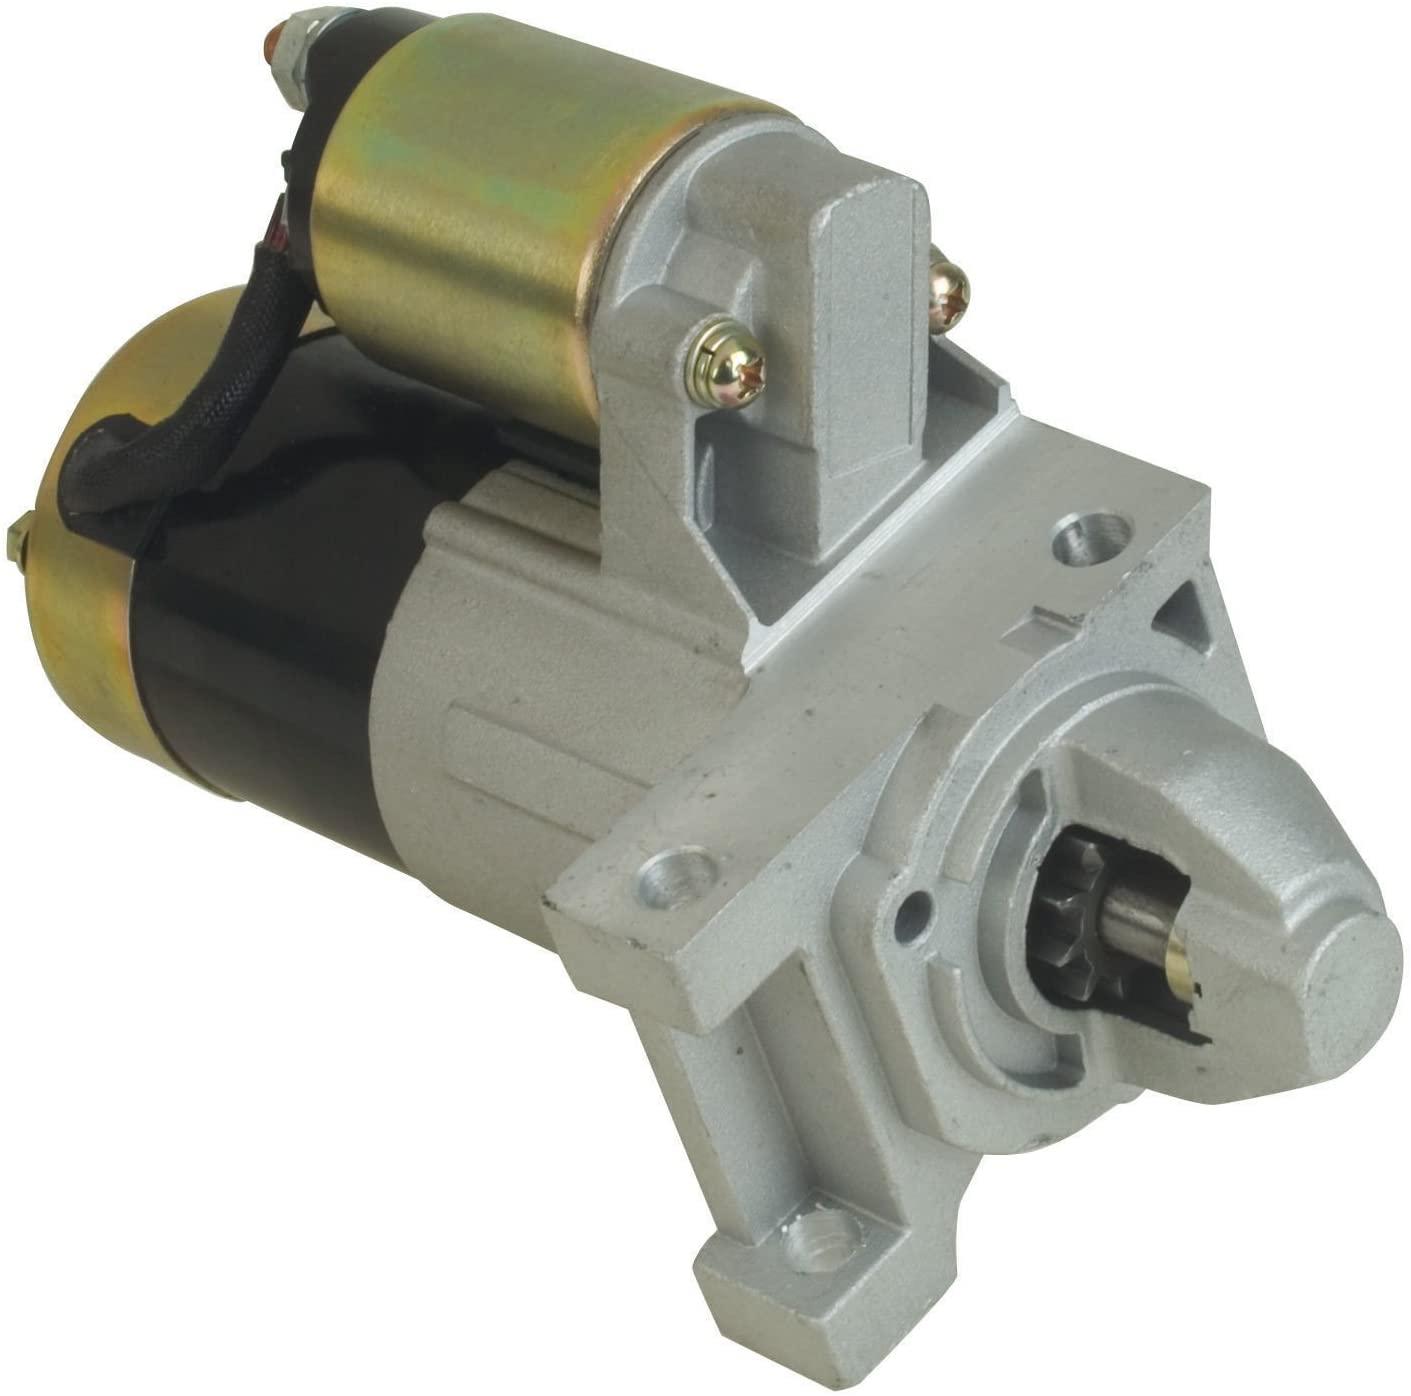 Starter compatible with Pontiac GTO 5.7L 6.0L V8 2004 05 2006 HOLDEN 92169668 17913